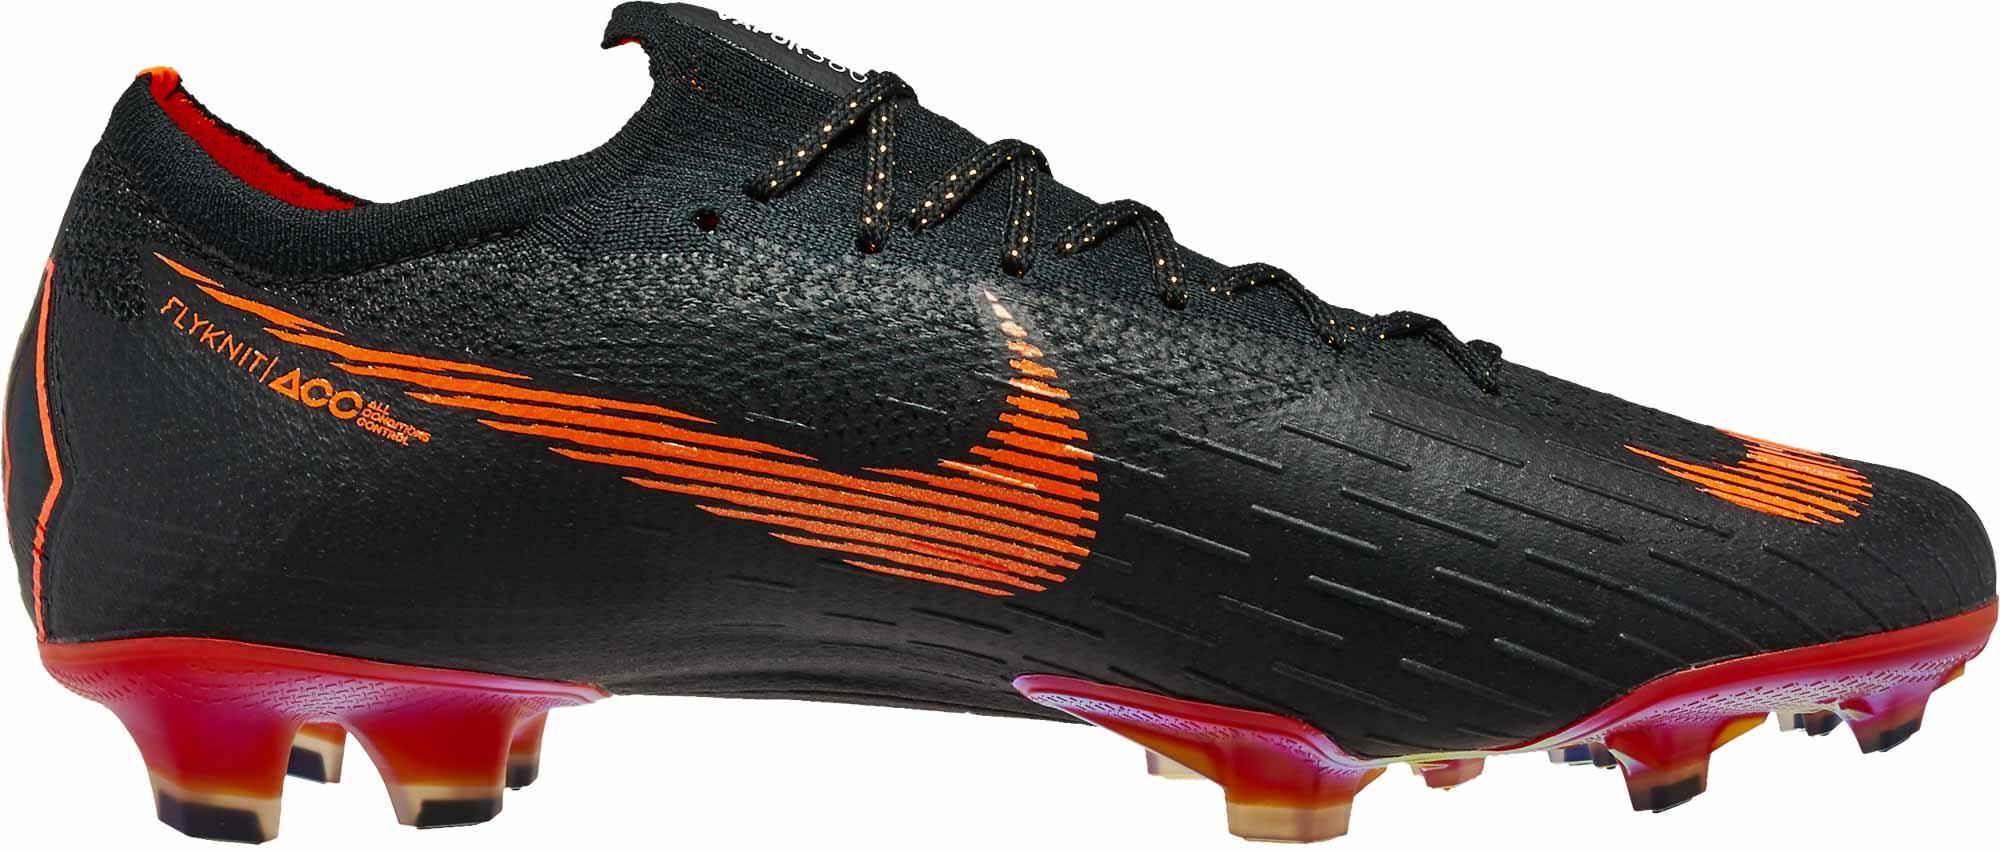 Nike Vapor Elite Shoes